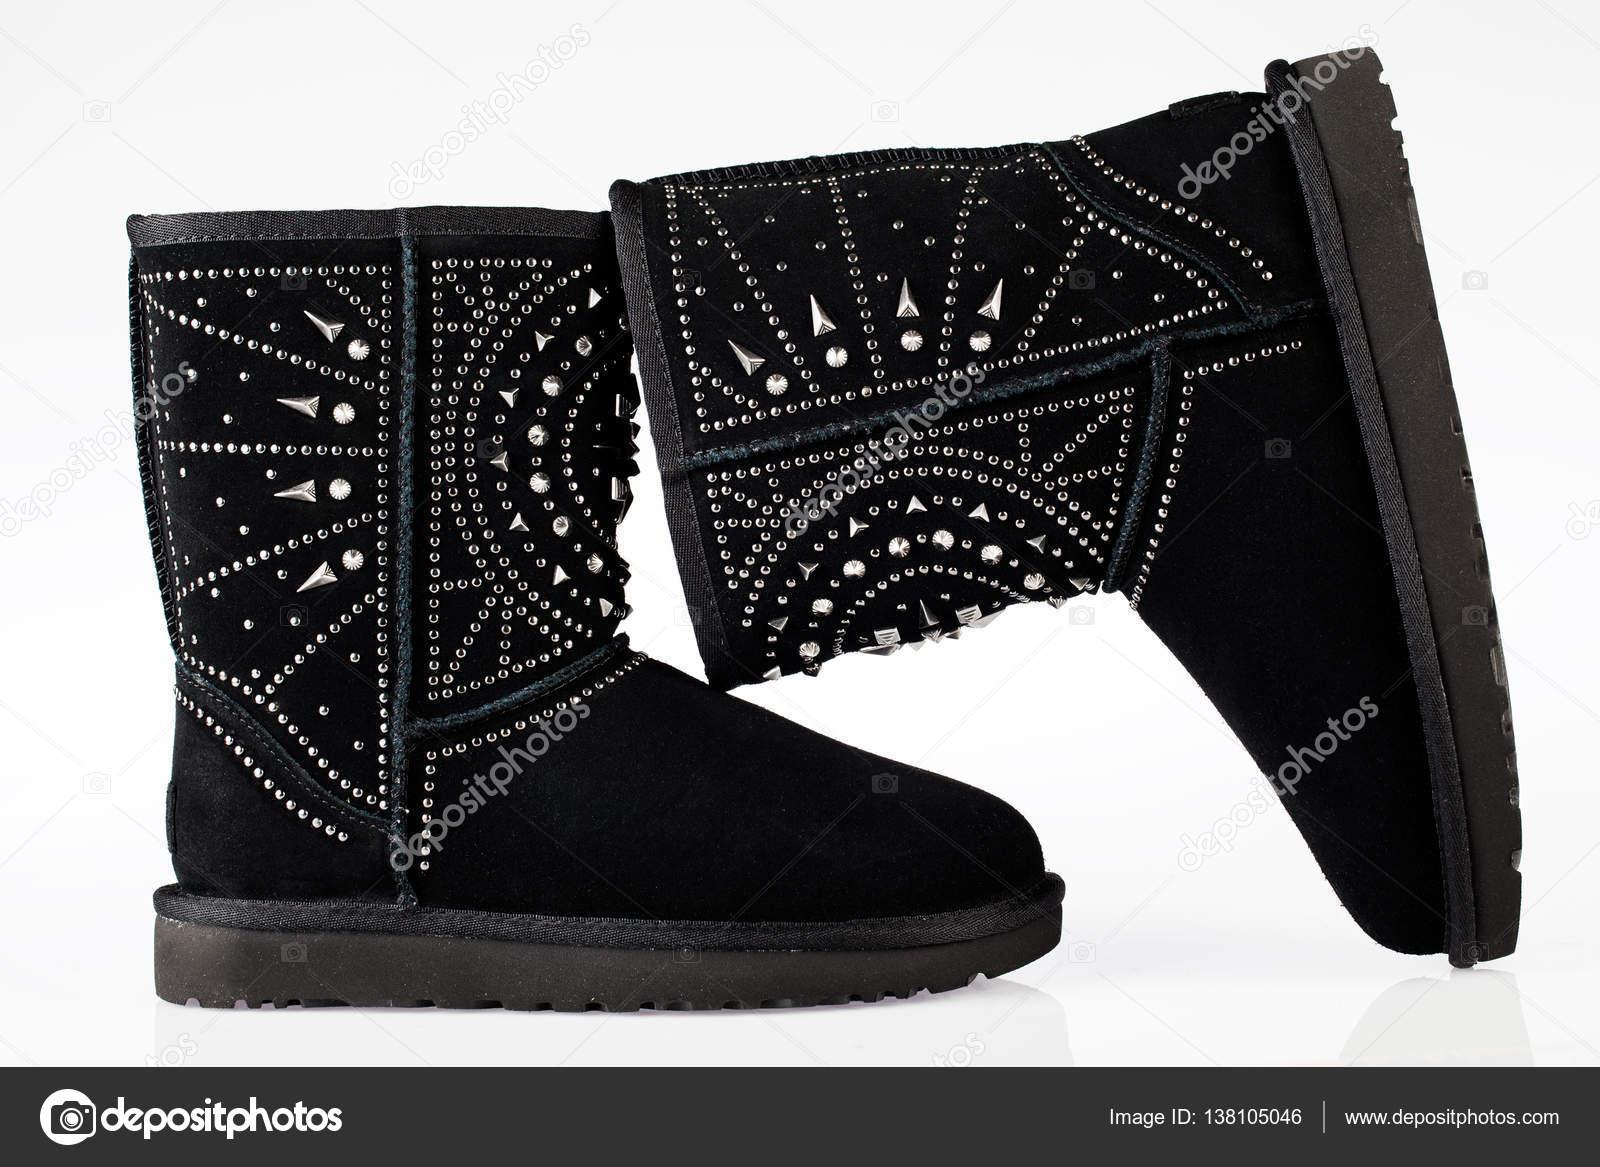 UGG Nieten Stiefel — Stockfoto © Lecaro #138105046